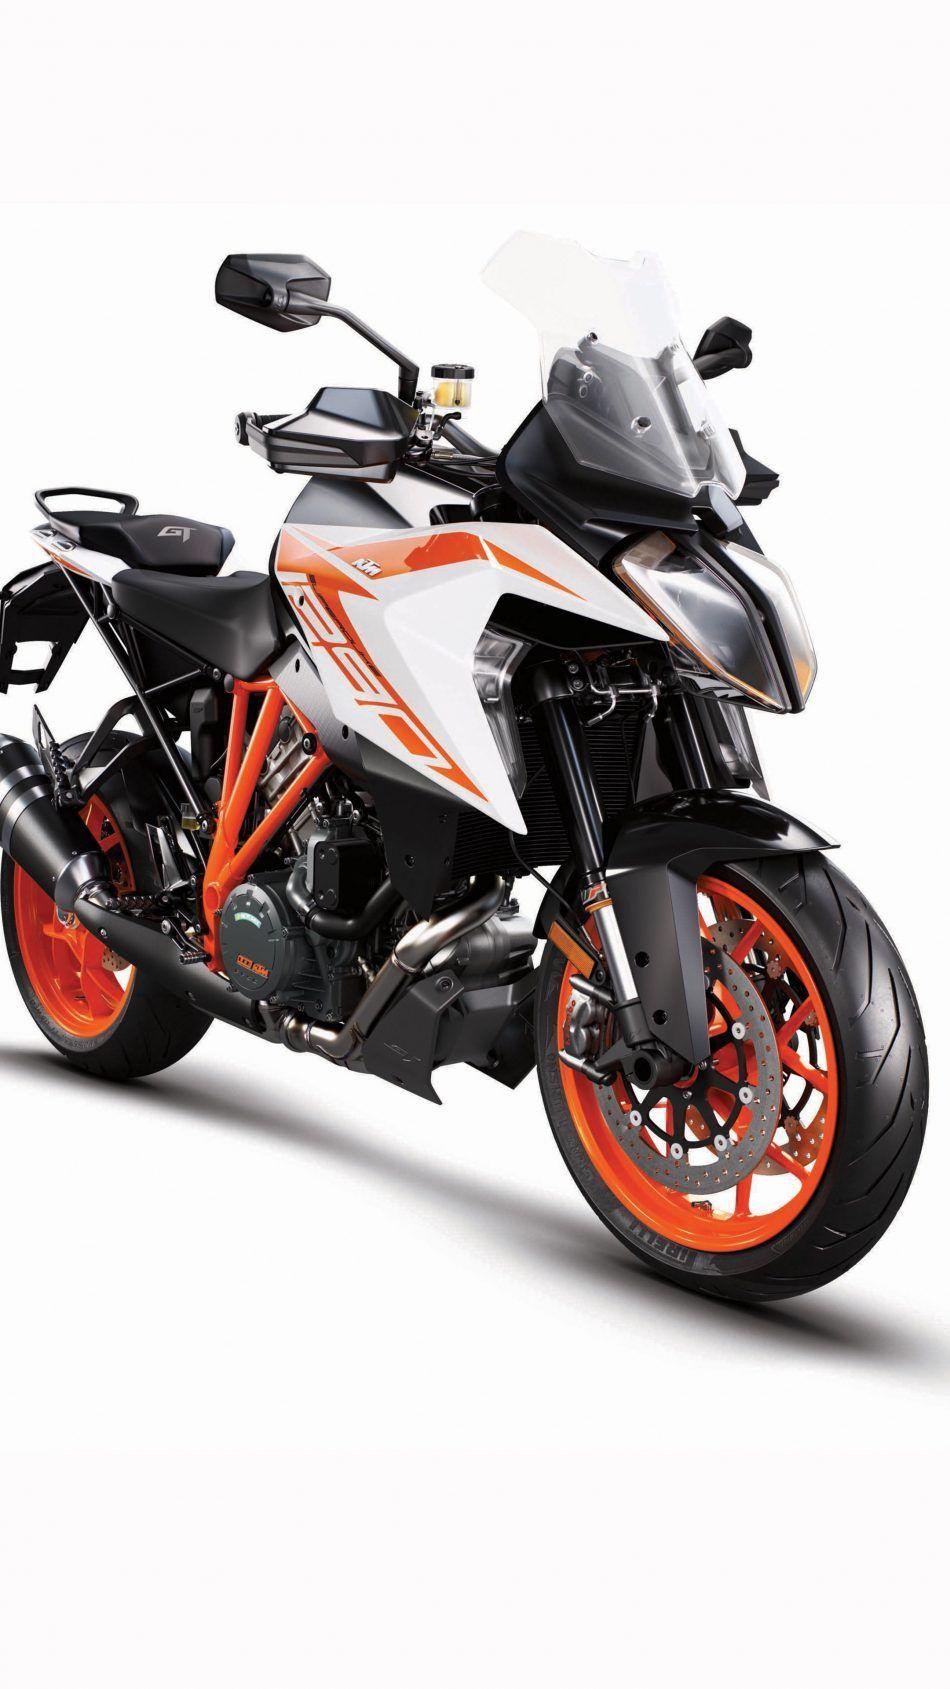 Ktm 1290 Super Duke Gt Ktm Super Bikes Motorcycle Wallpaper